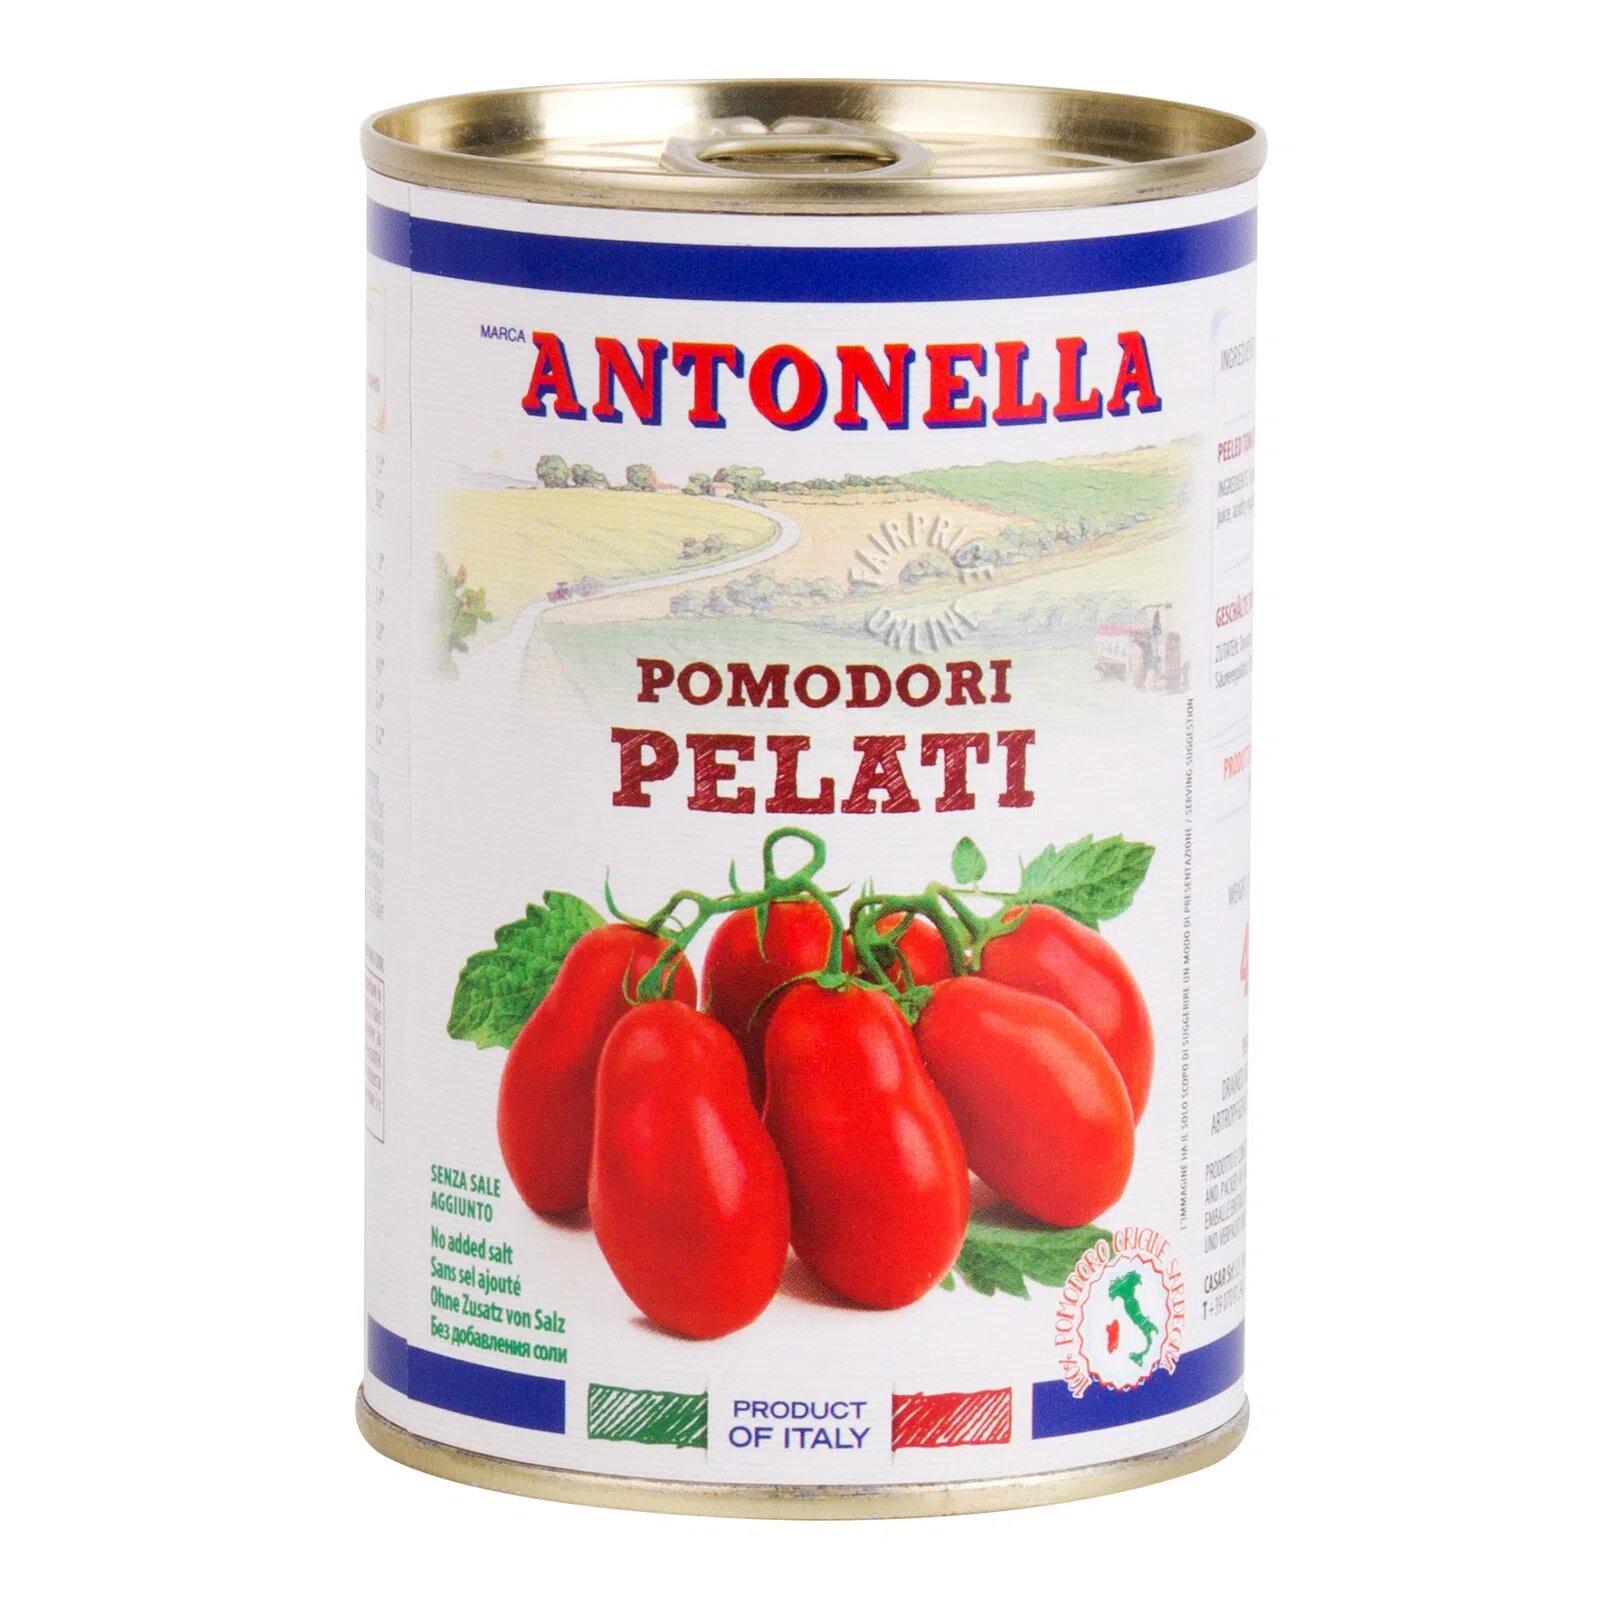 Antonella Whole Peeled Tomato